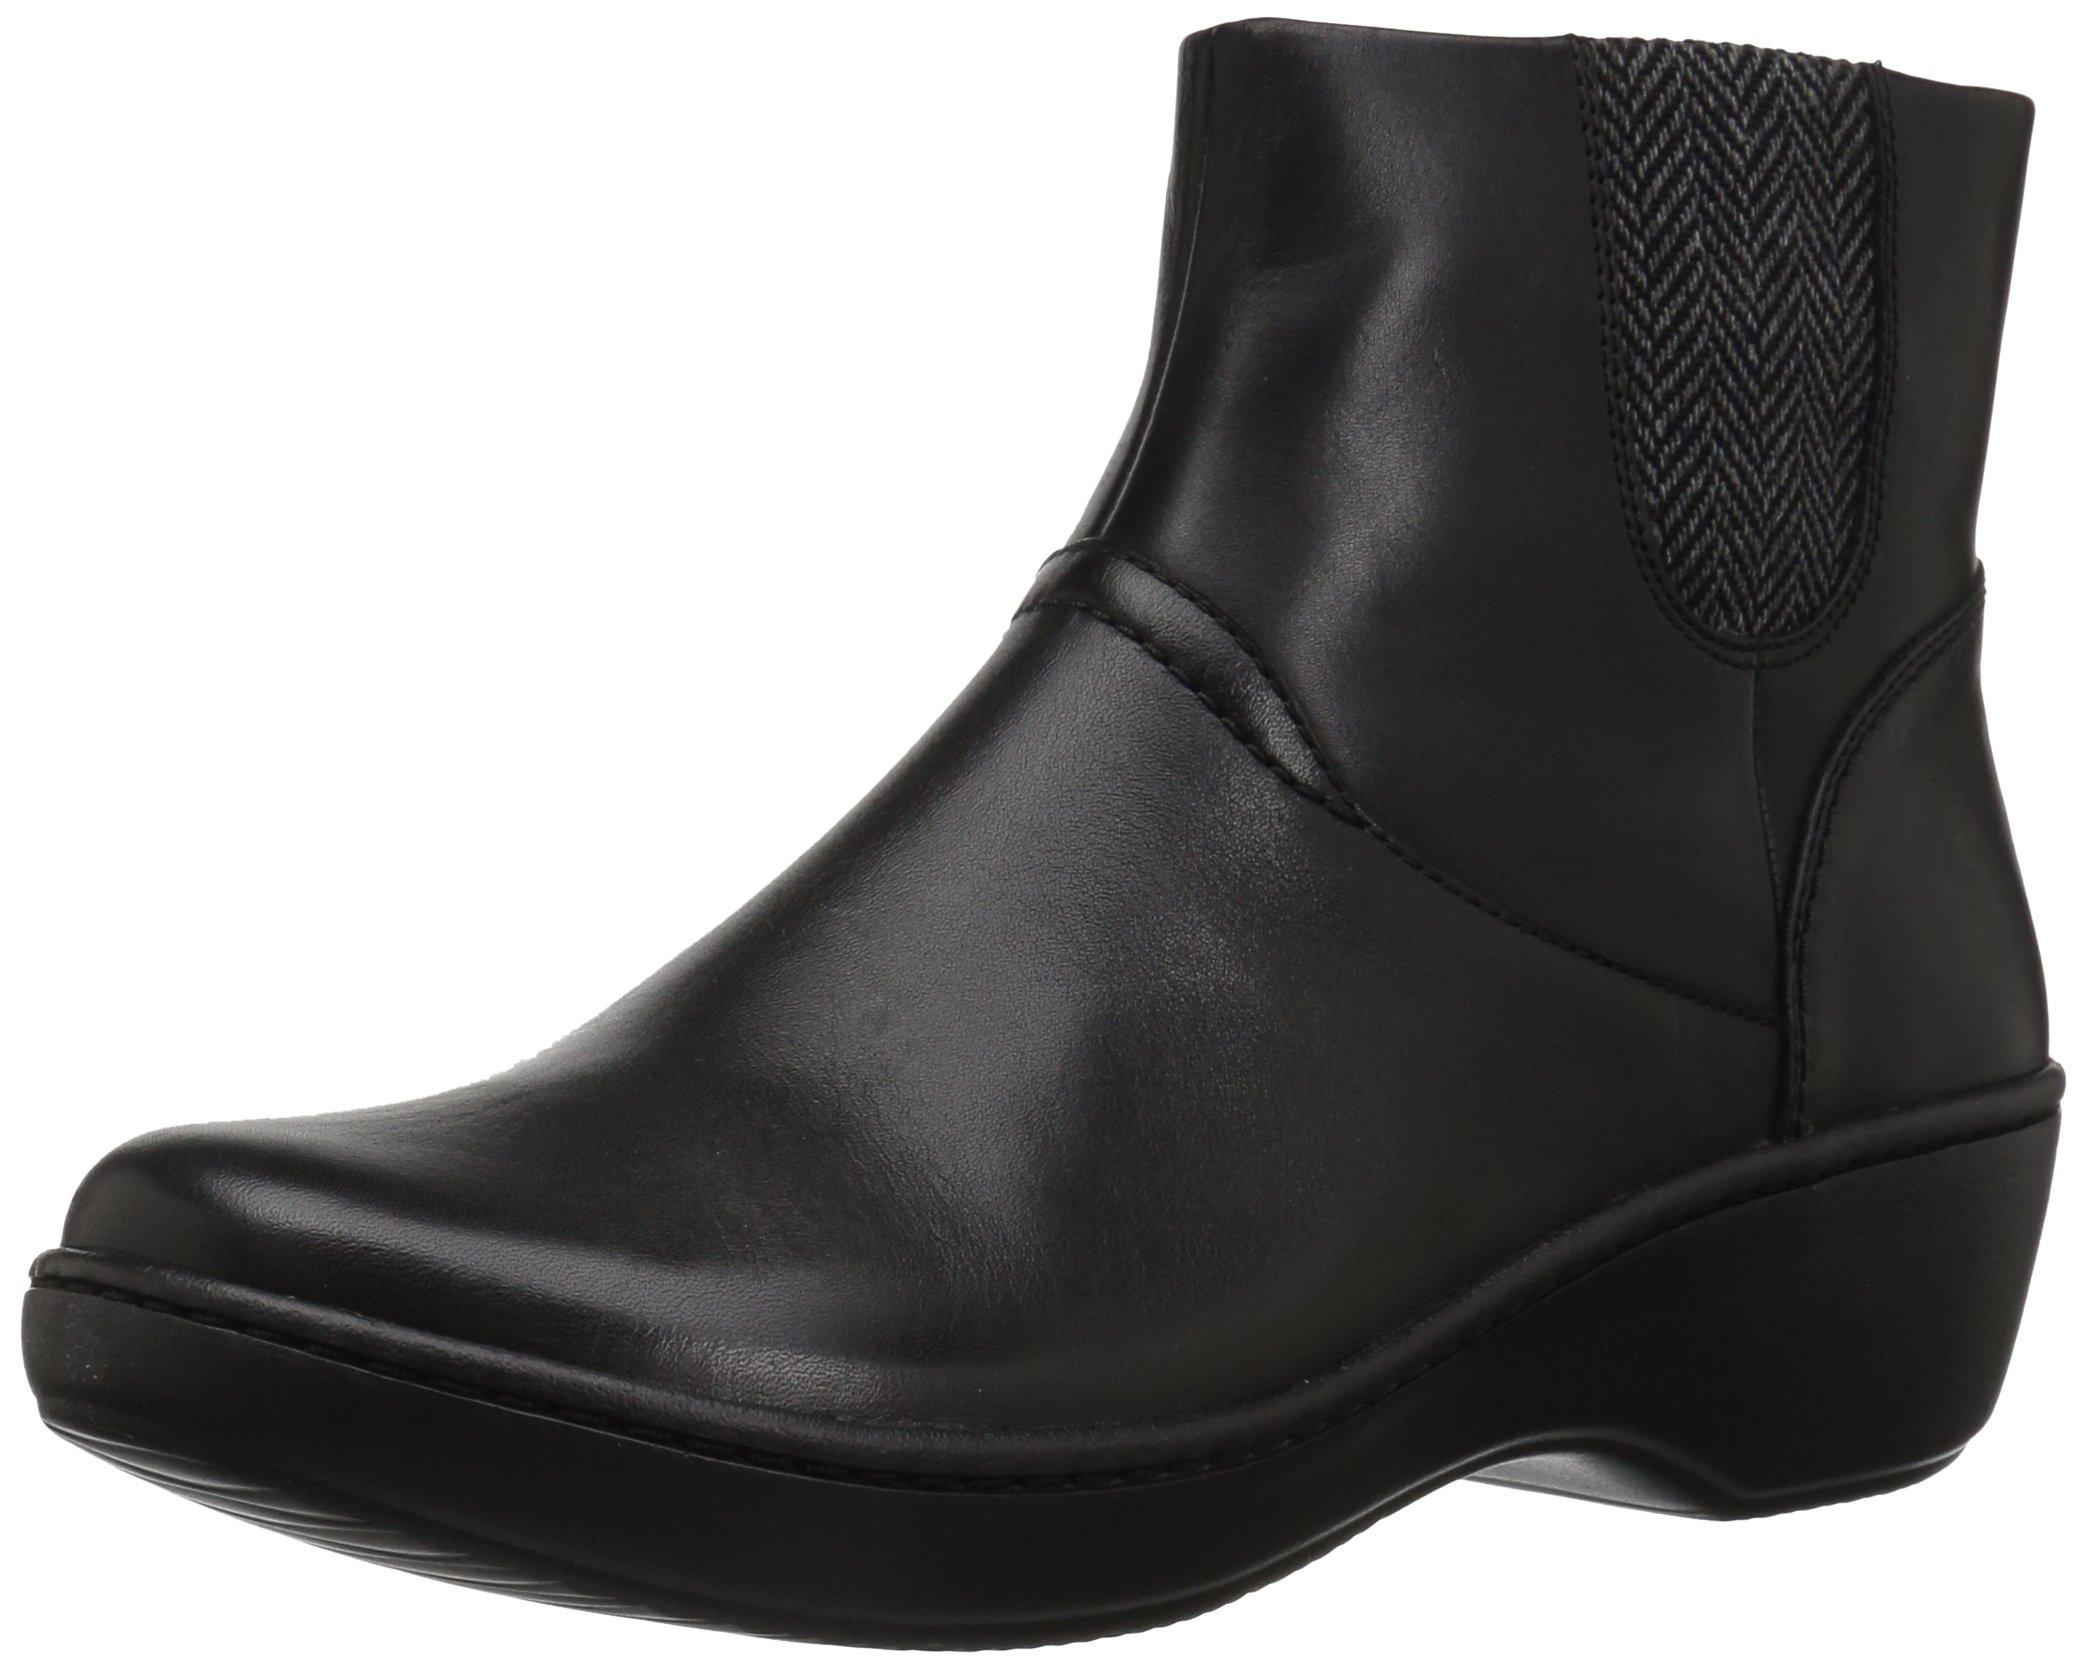 Clarks Women's Delana Joleen Boot, Black Leather, 9.5 M US